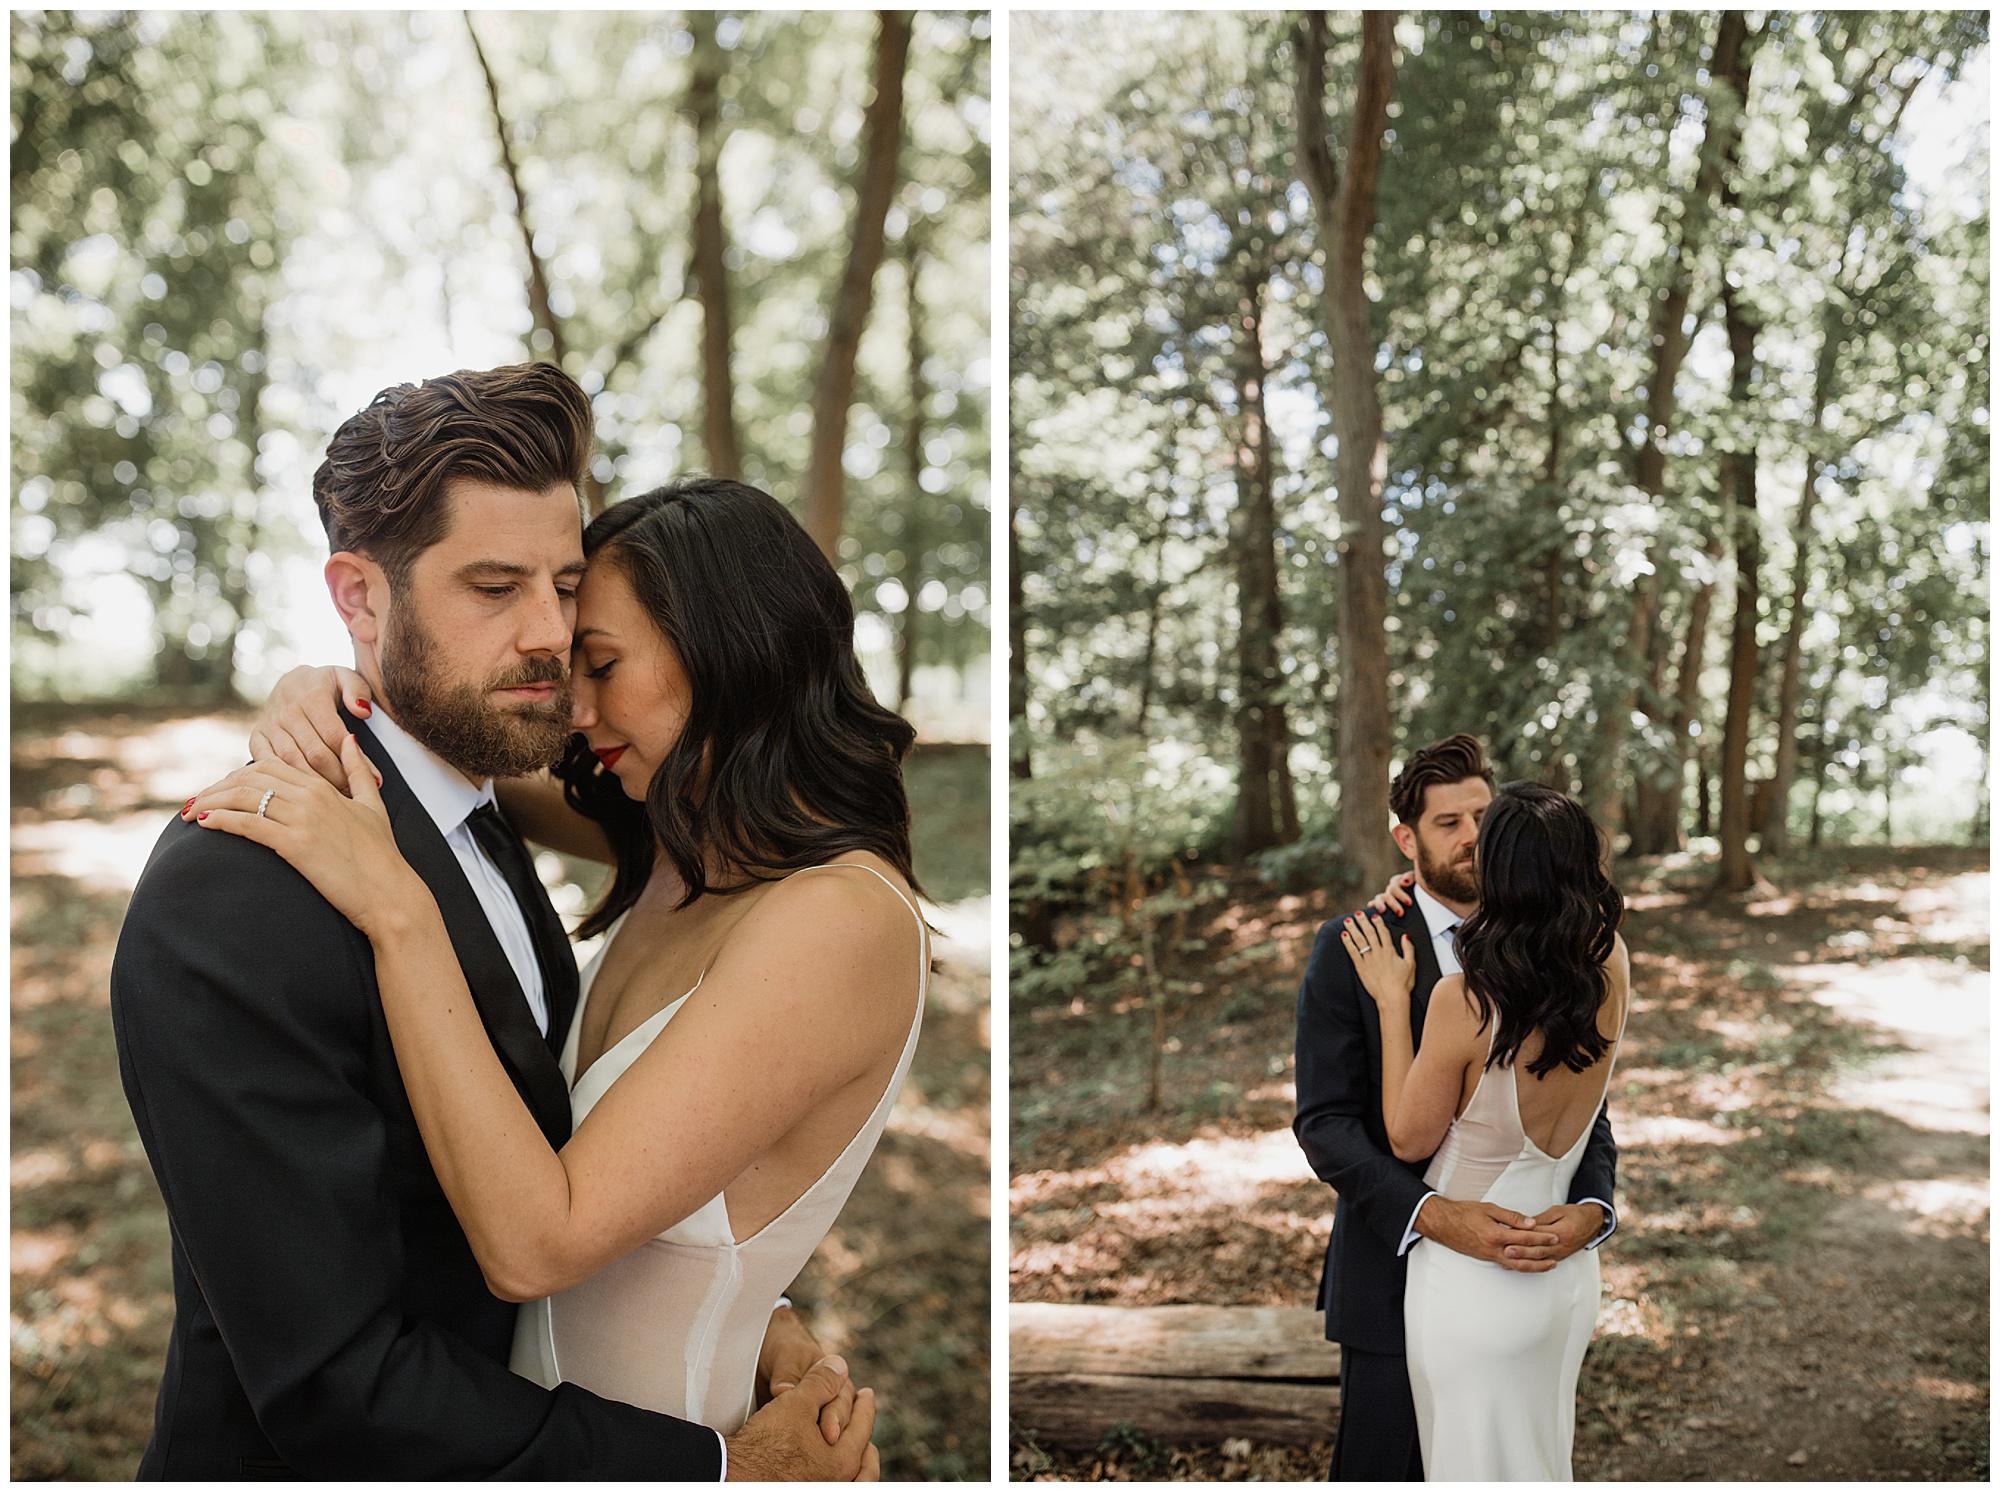 allerton_park_wedding_champaign_il_chicago_wright_photographs_ne_0009.jpg